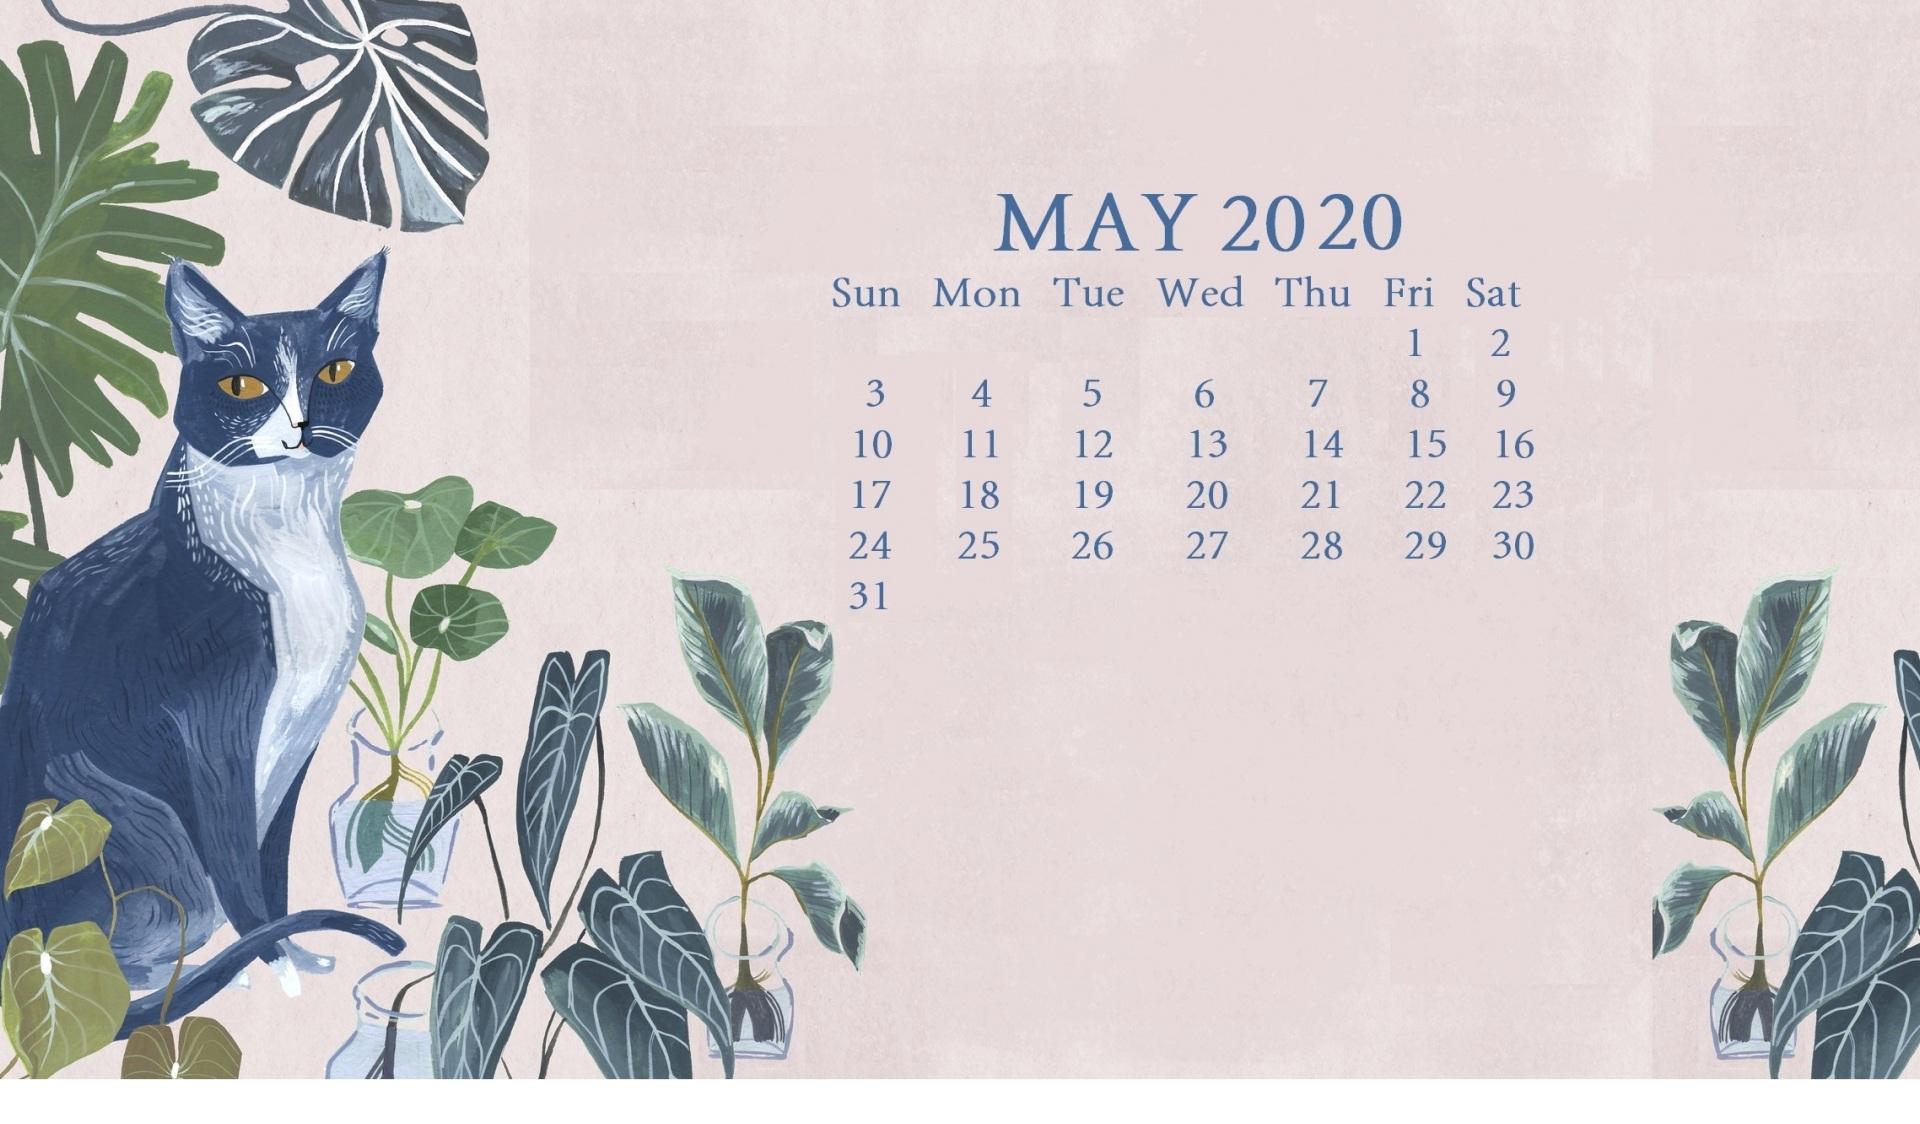 May 2020 Editable Calendar